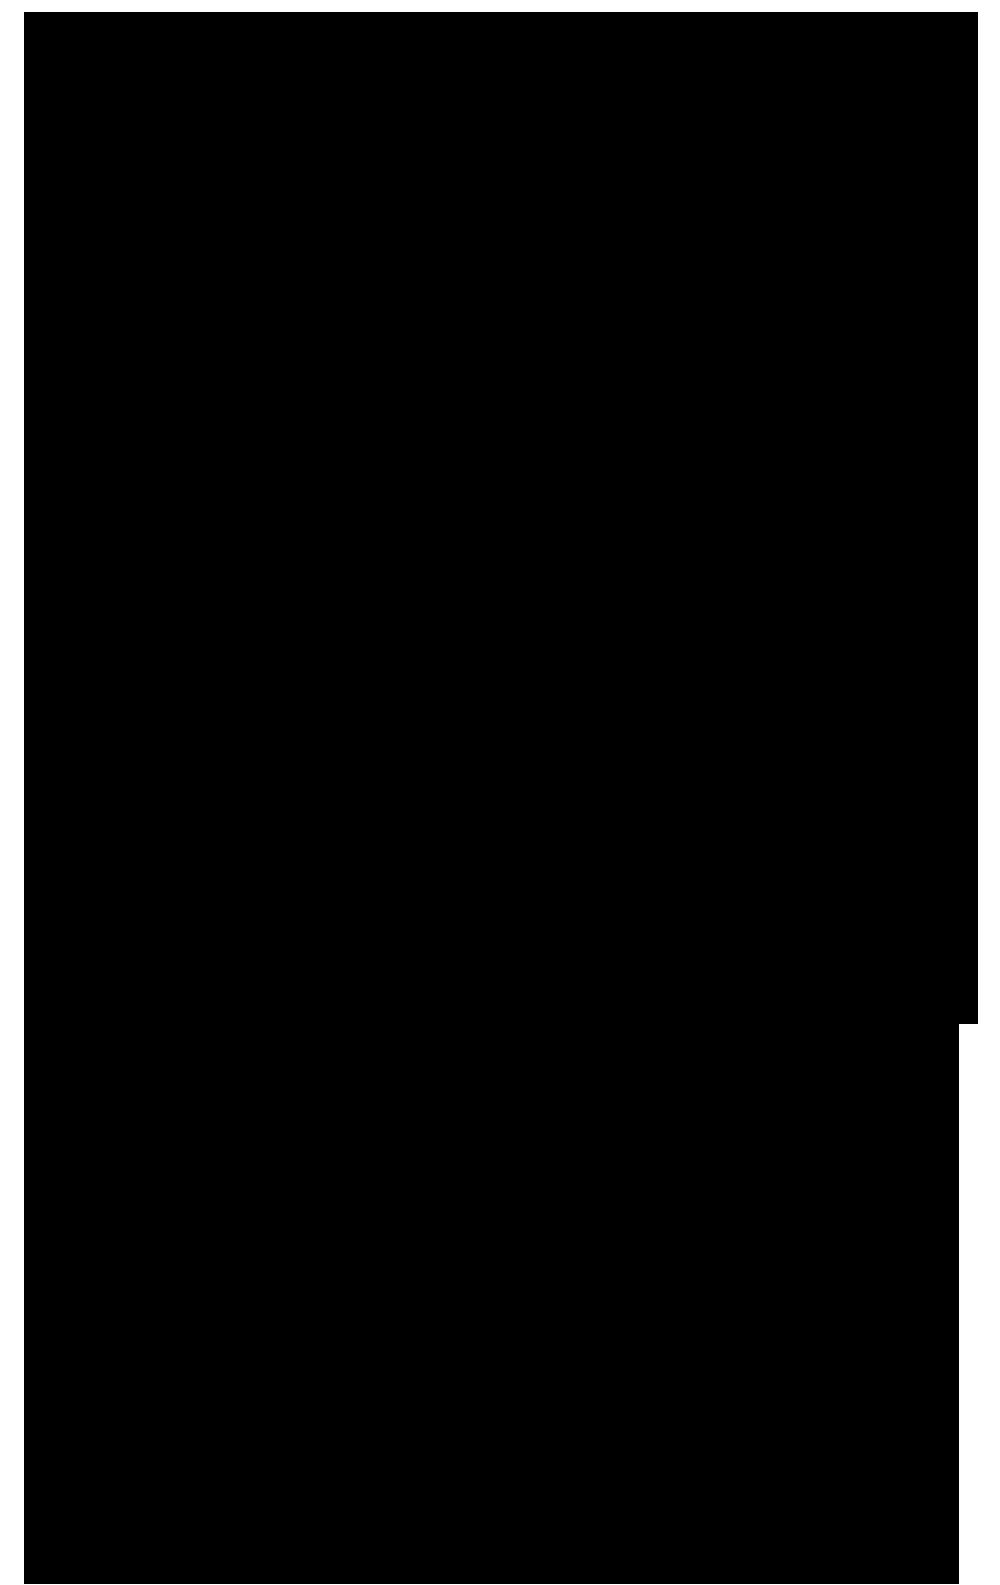 AIDA format in a Gary Halbert ad